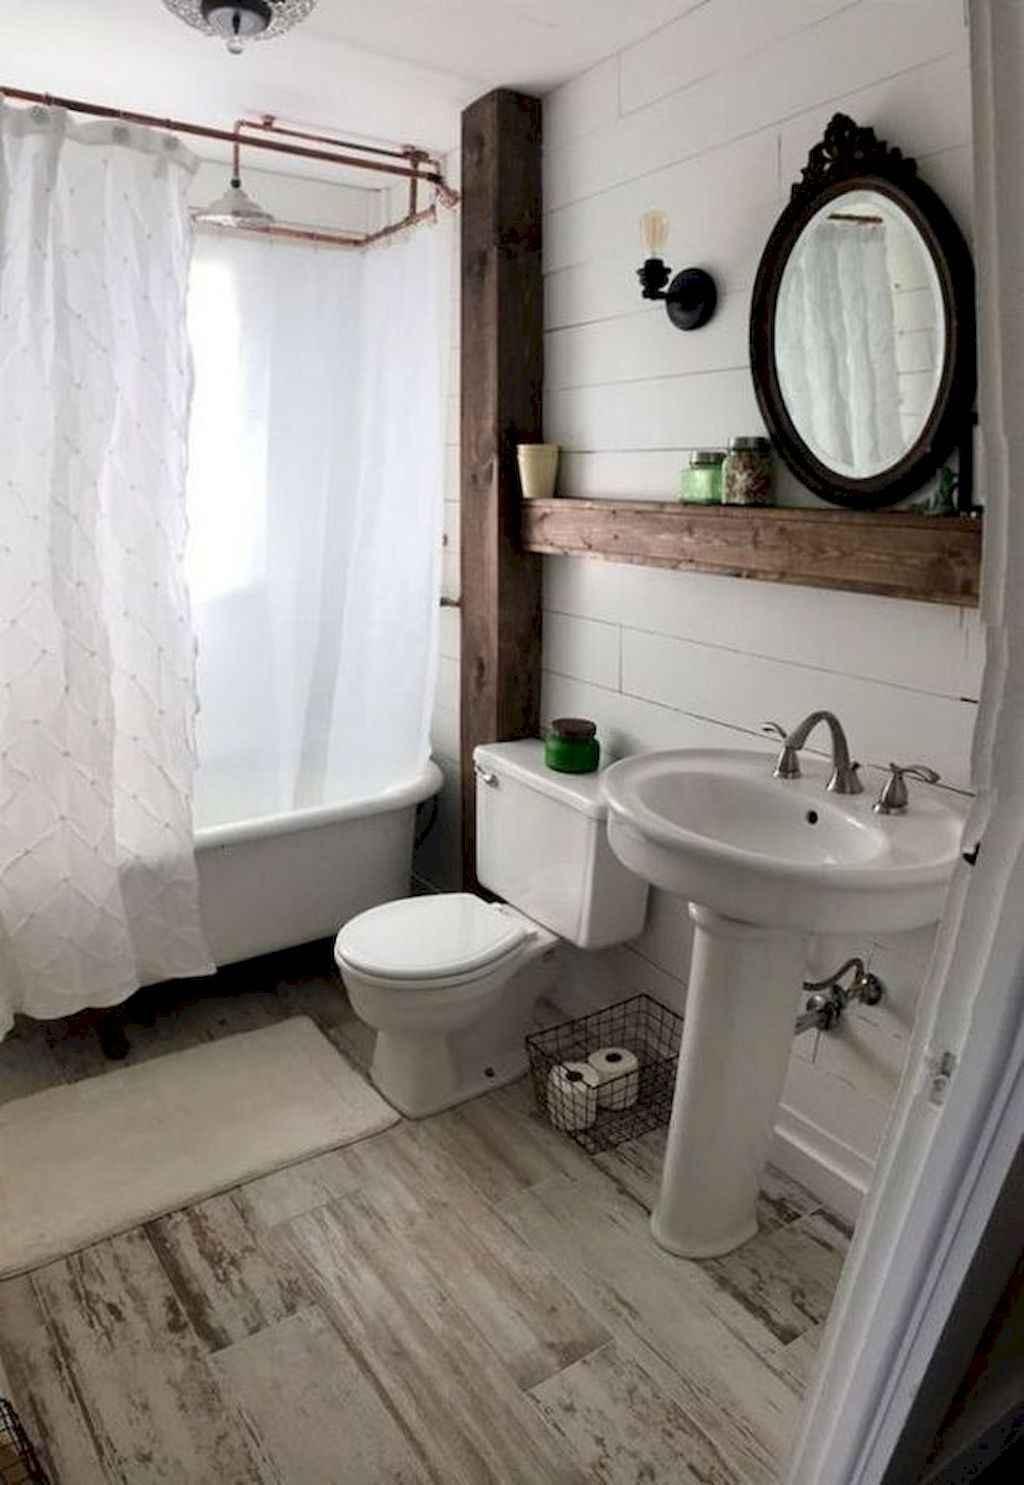 Rustic Farmhouse Master Bathroom Remodel Ideas 53 Homespecially